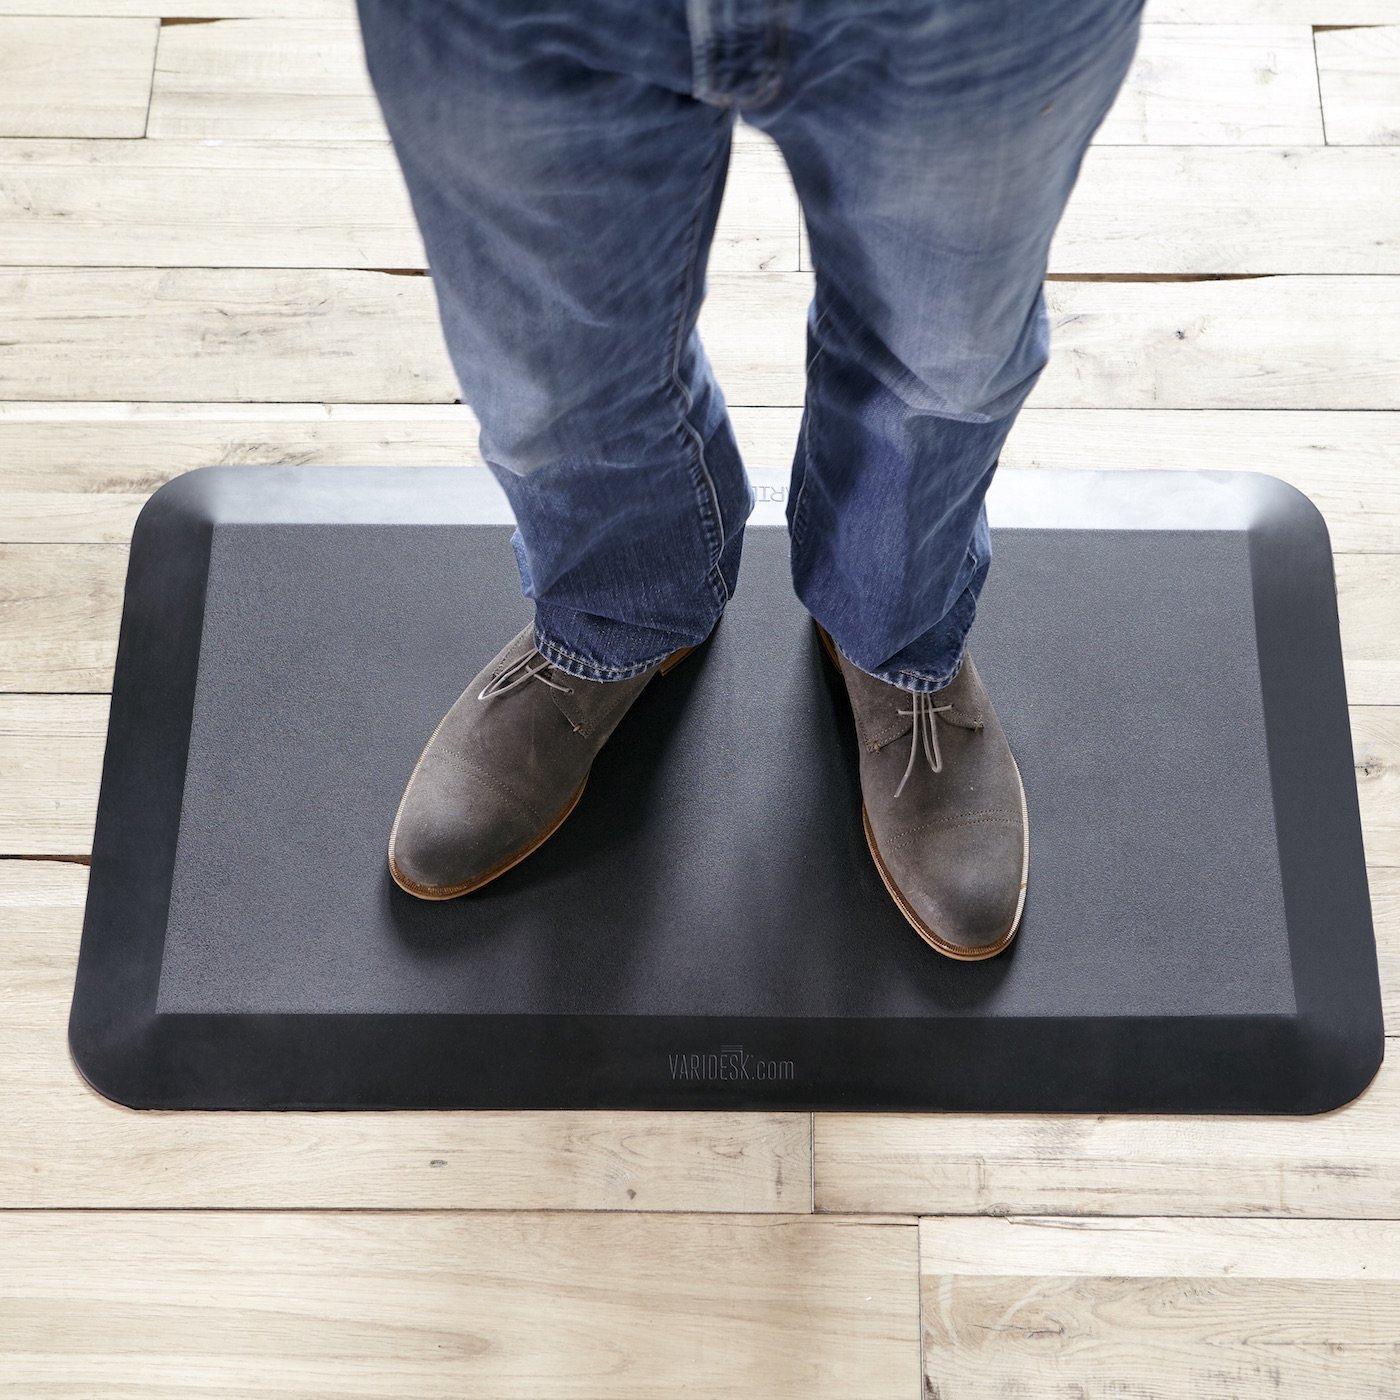 BFMOM cushioned kitchen floor mats Amazon com VARIDESK 5 8 Non Slip Anti Fatigue Comfort Mat 20 x34 for Kitchens or Standing Desk Home Improvement